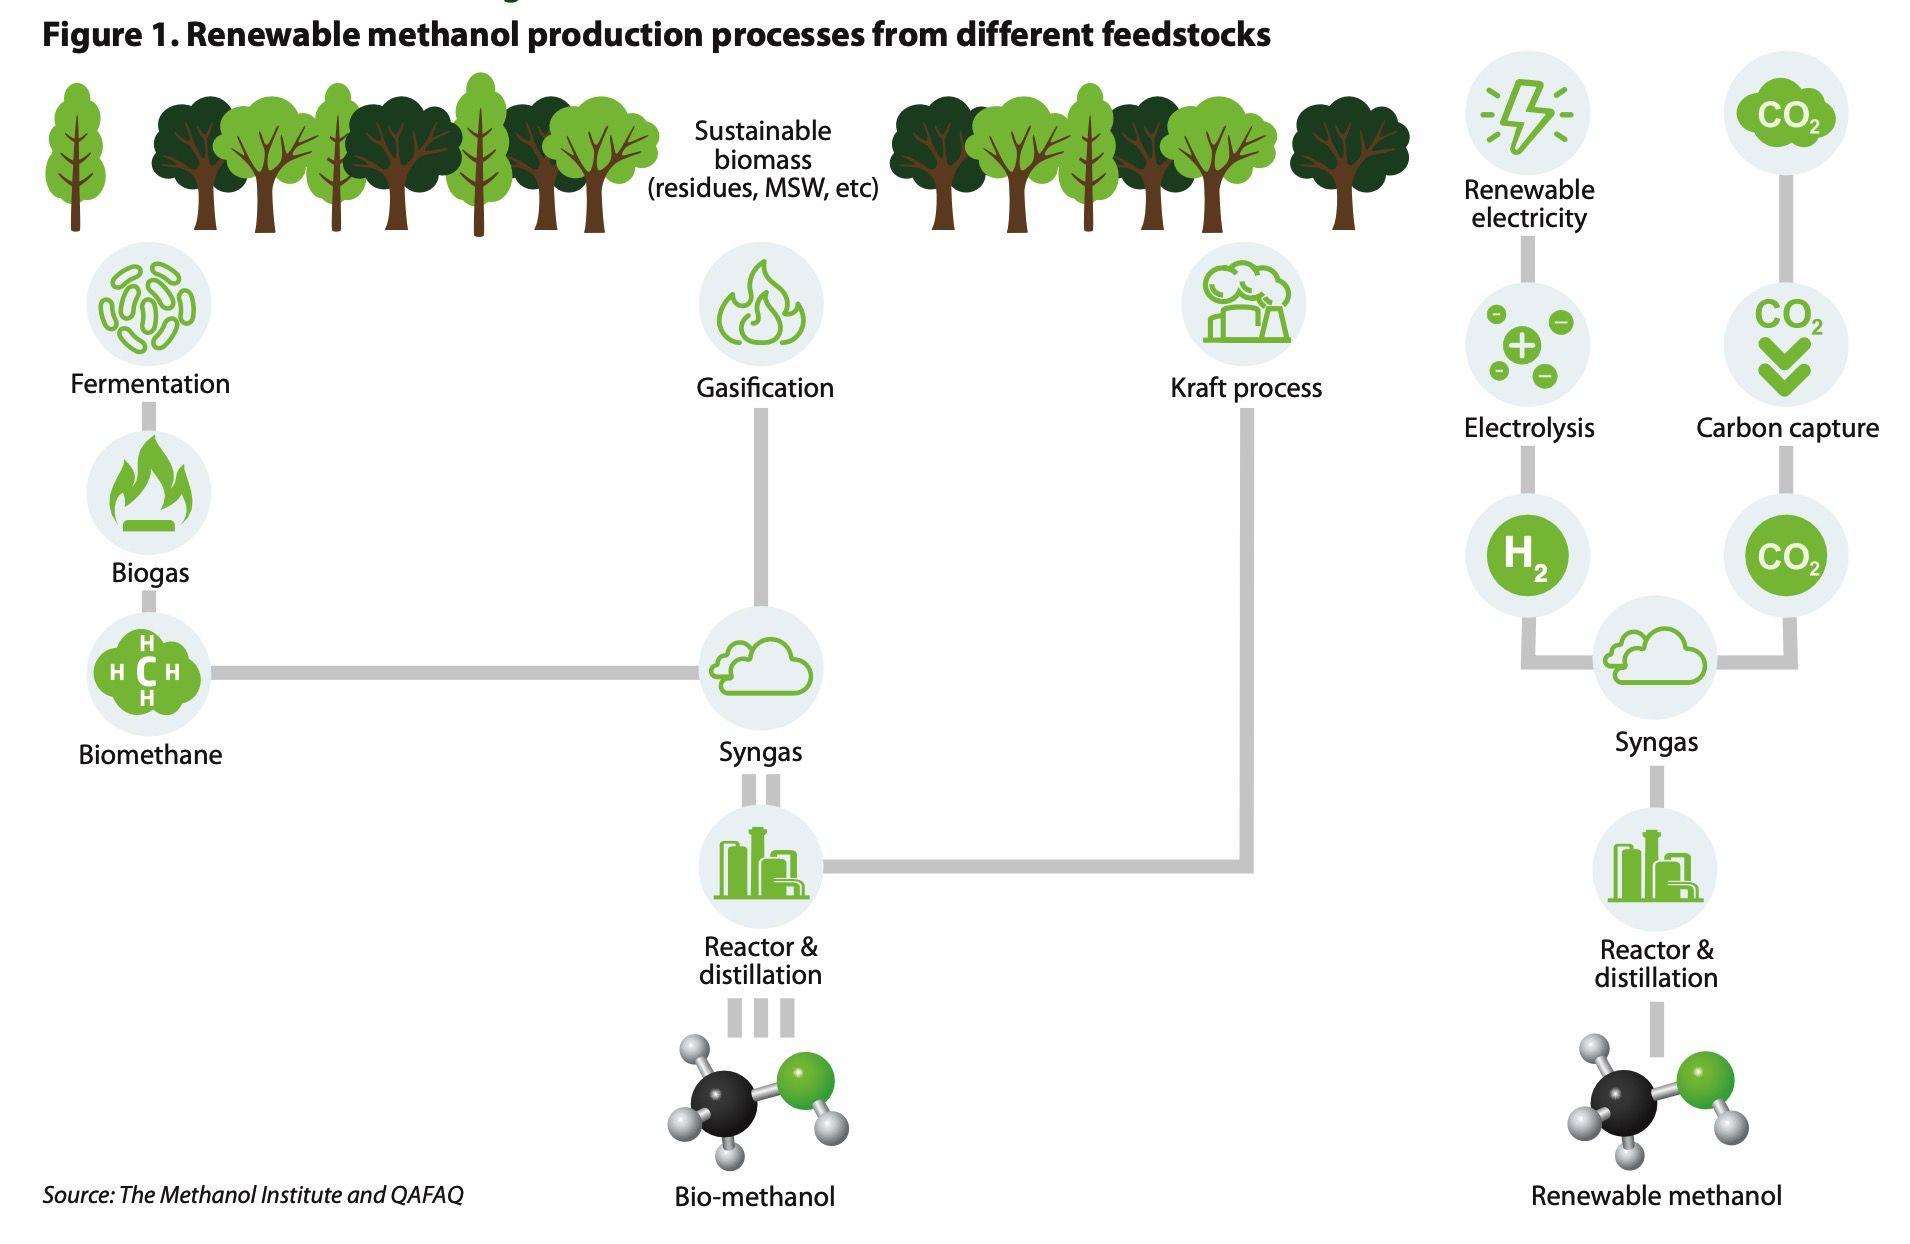 bio-methanol production